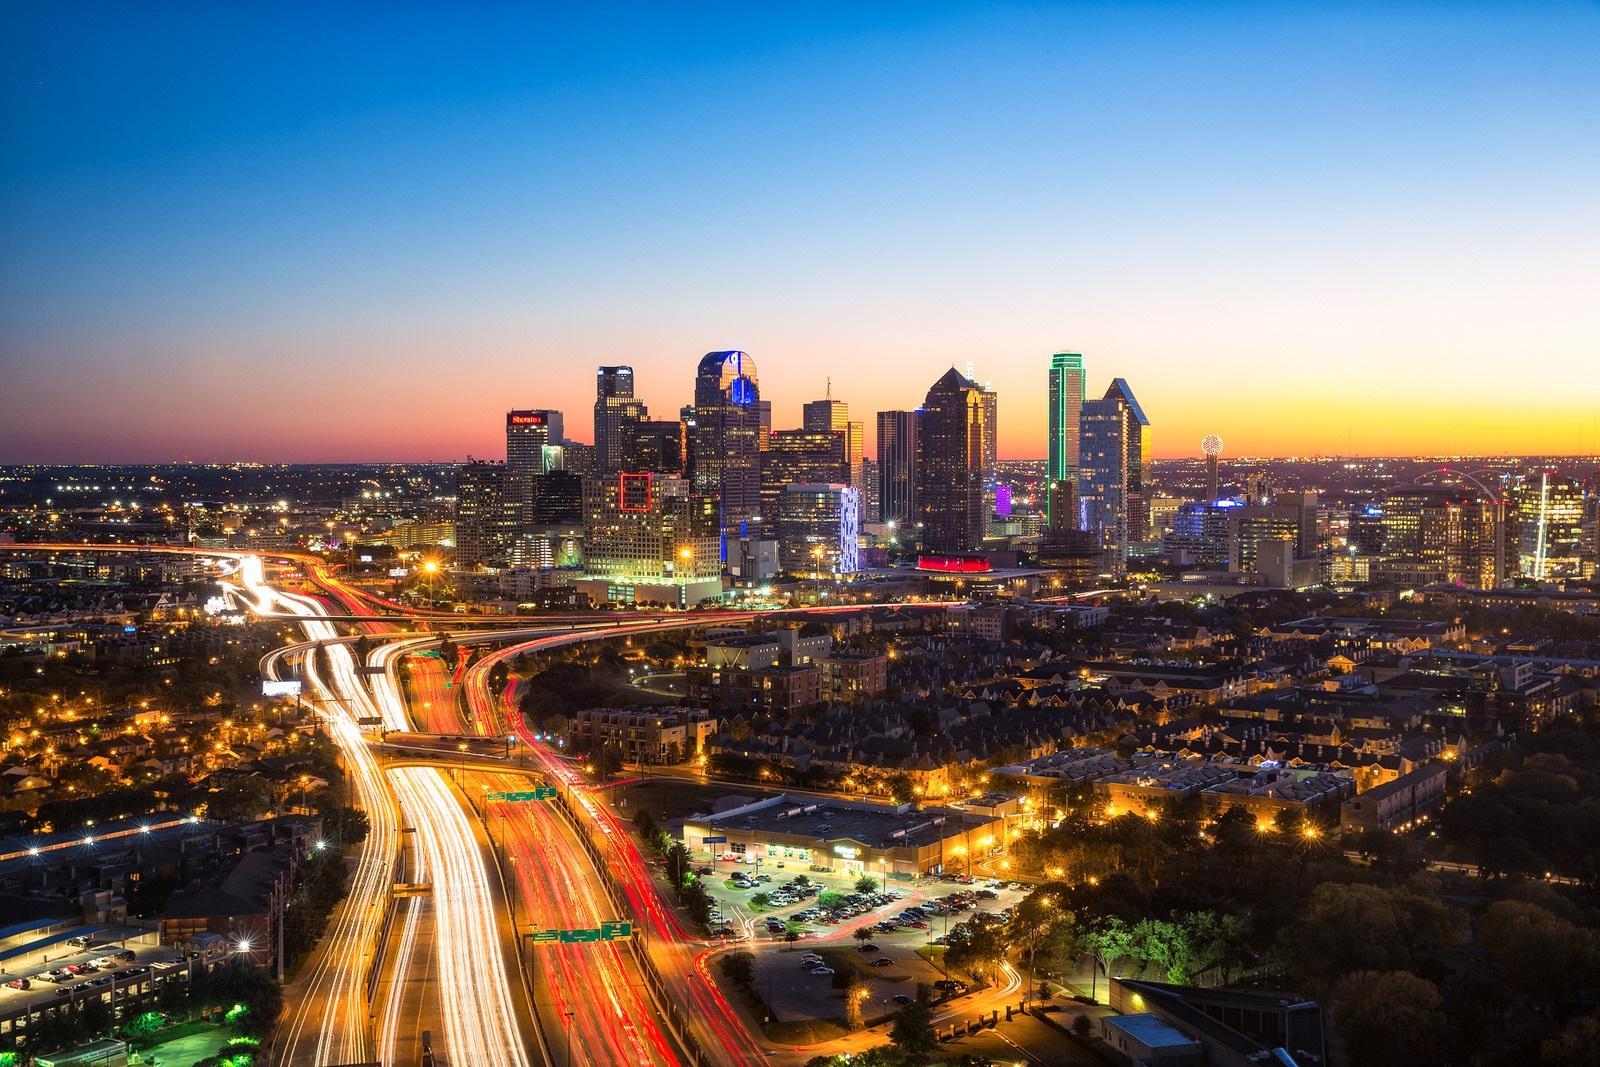 Dallas Skyline at Dusk with Sunset. Photo: Stephen Masker